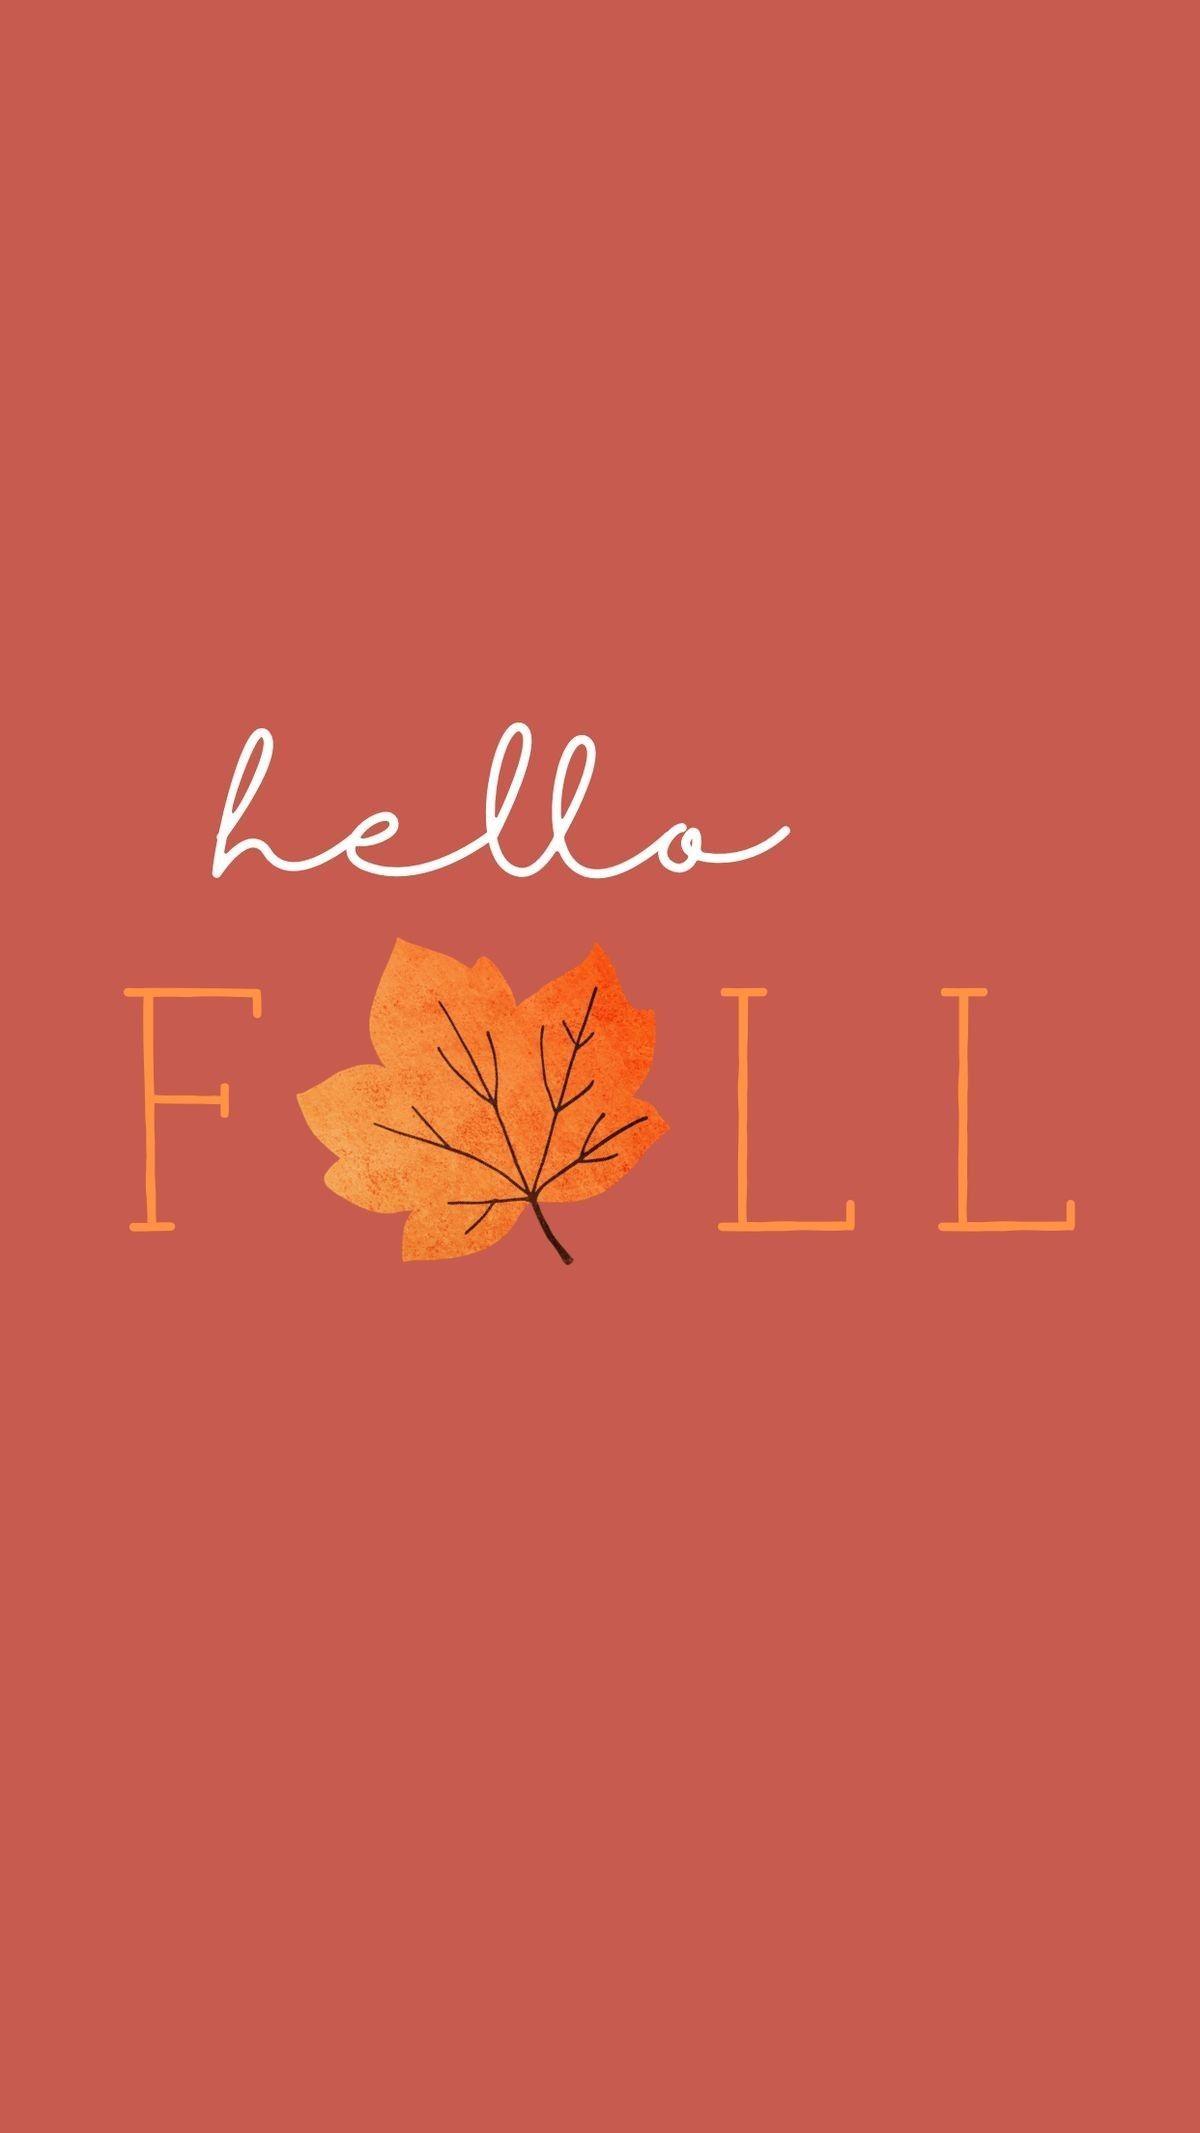 Keet Op Instagram Verwerk Prachtige Gedroogde Bloemen Grassen En Kruiden Welcome To Blog Iphone Wallpaper Fall Fall Wallpaper Cute Fall Wallpaper